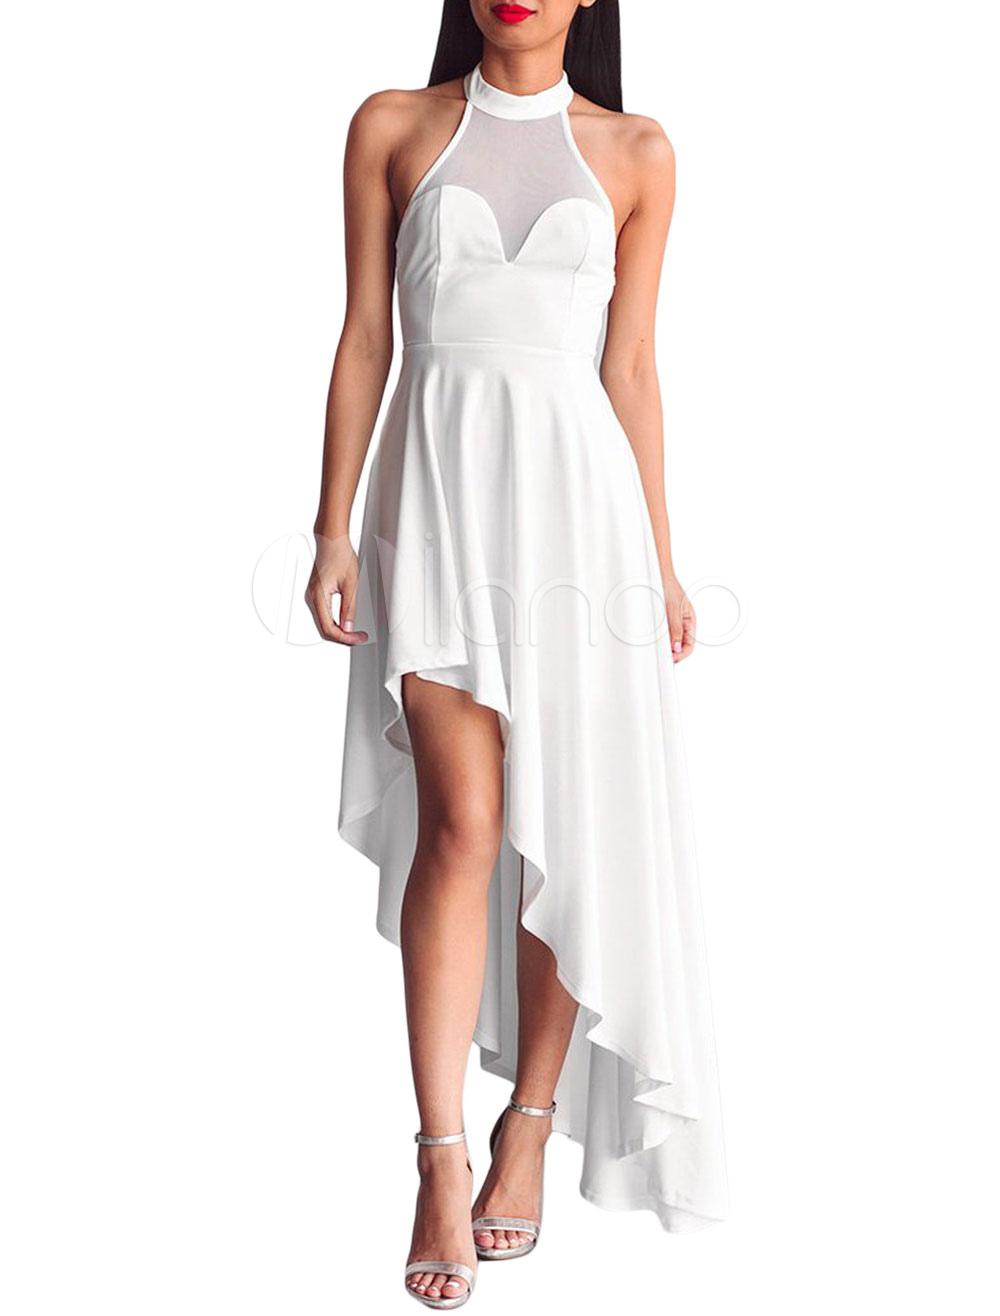 Women White Dress Party Dress High Low Crewneck Sleeveless Pleated Formal Dress (Women\\'s Clothing Maxi Dresses) photo